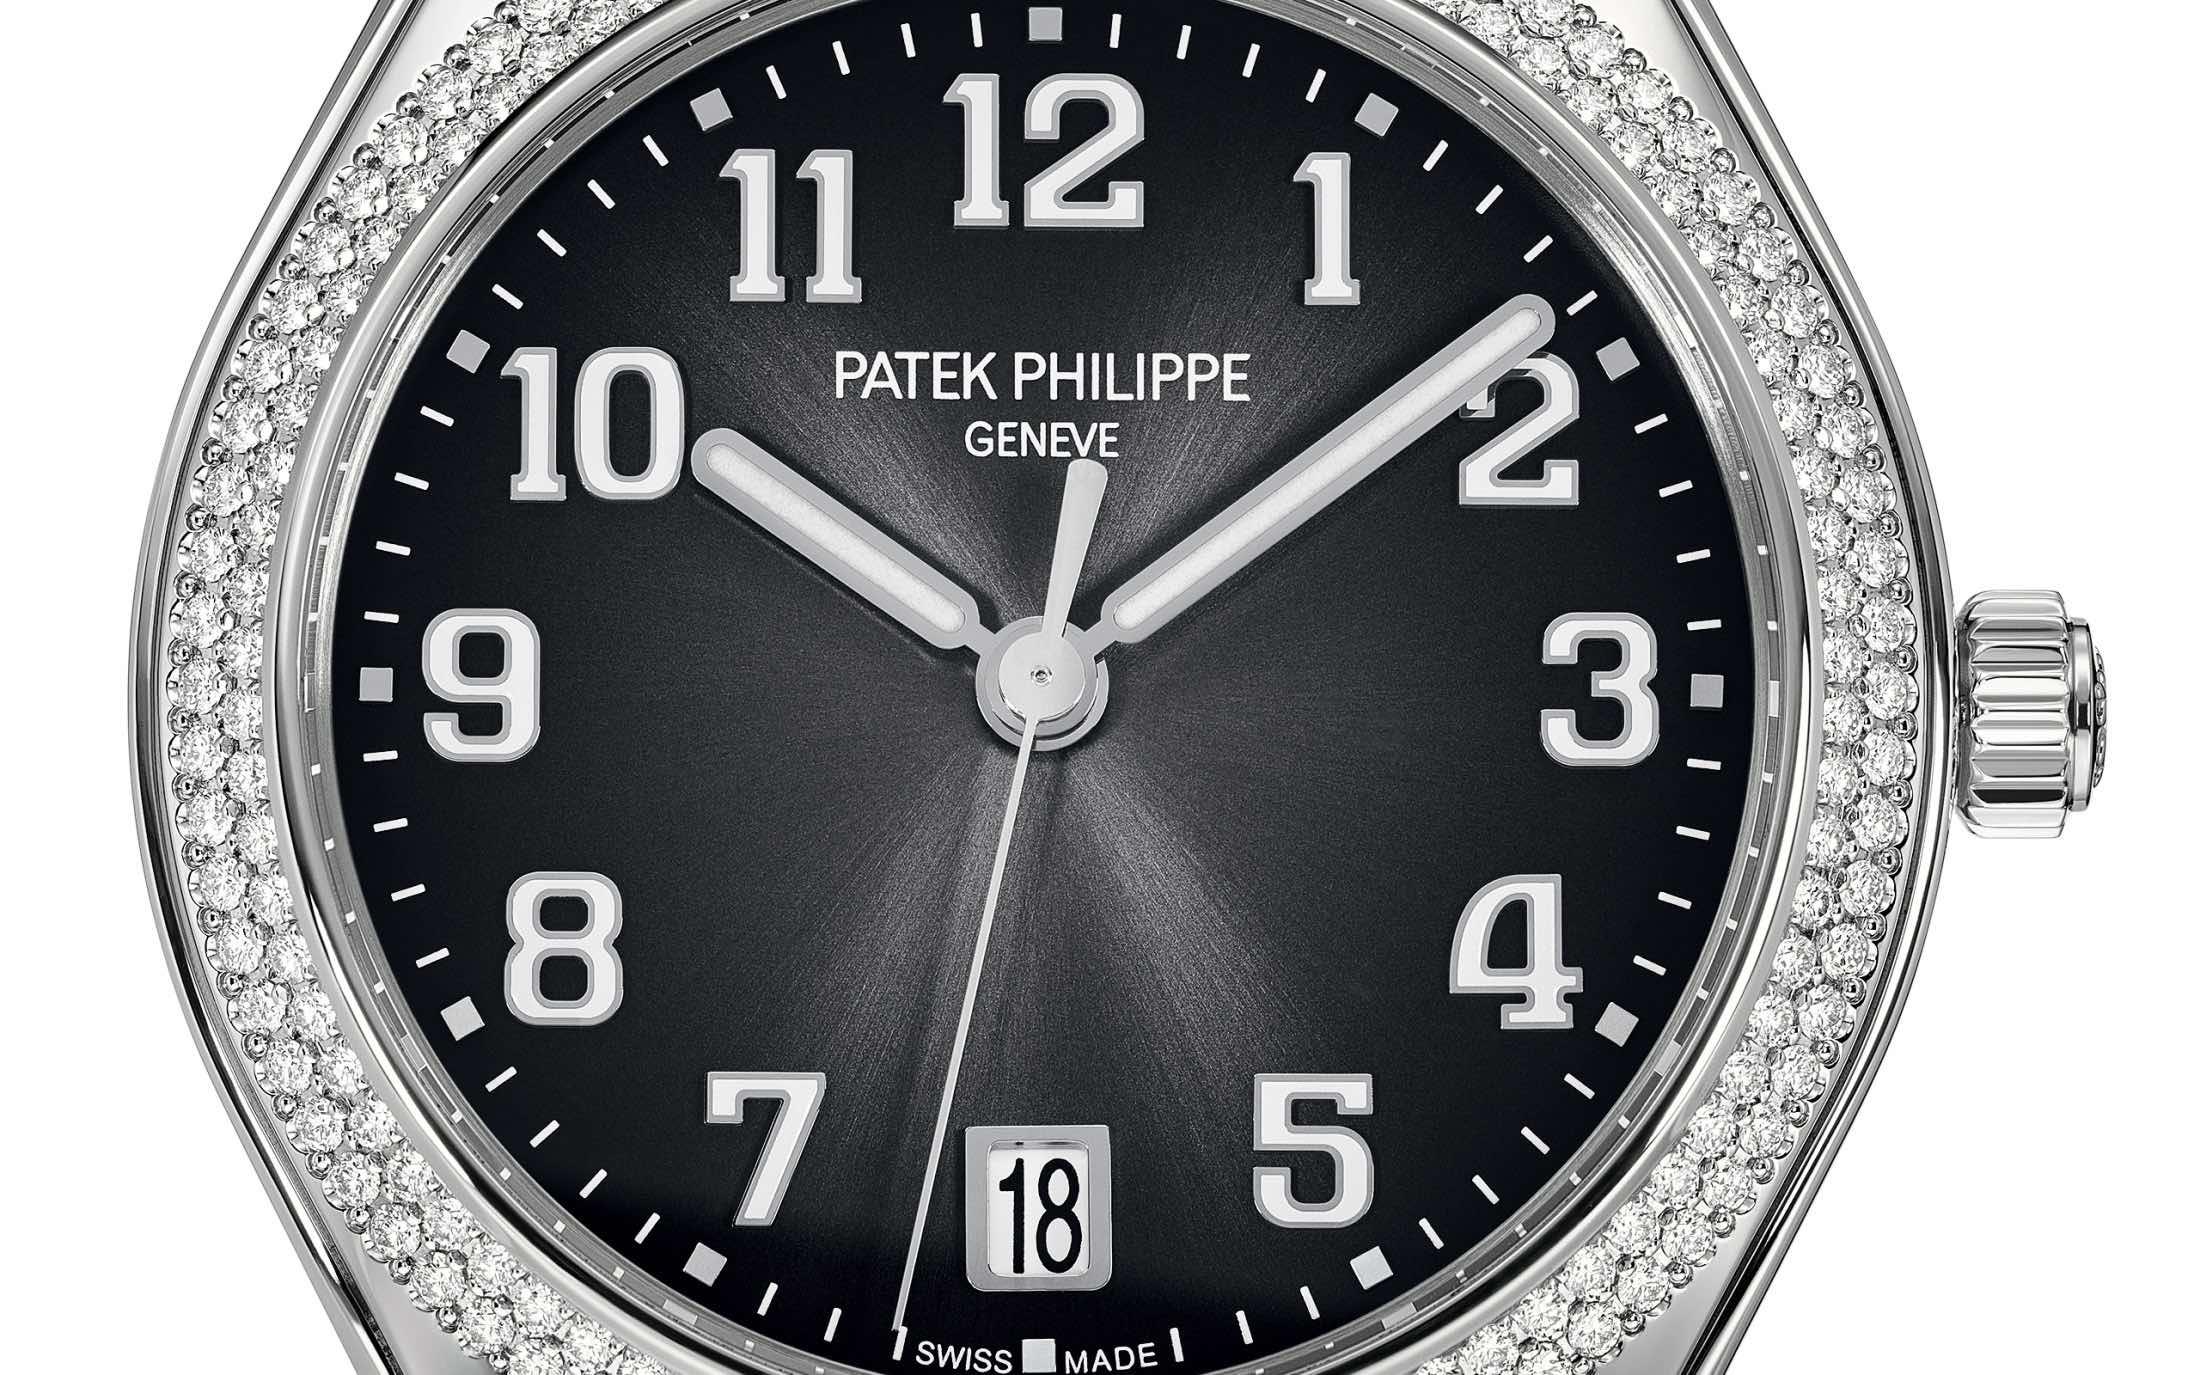 87f6376f729 Introducing - 2018 Patek Philippe Twenty-4 Automatic 7300 (Specs ...